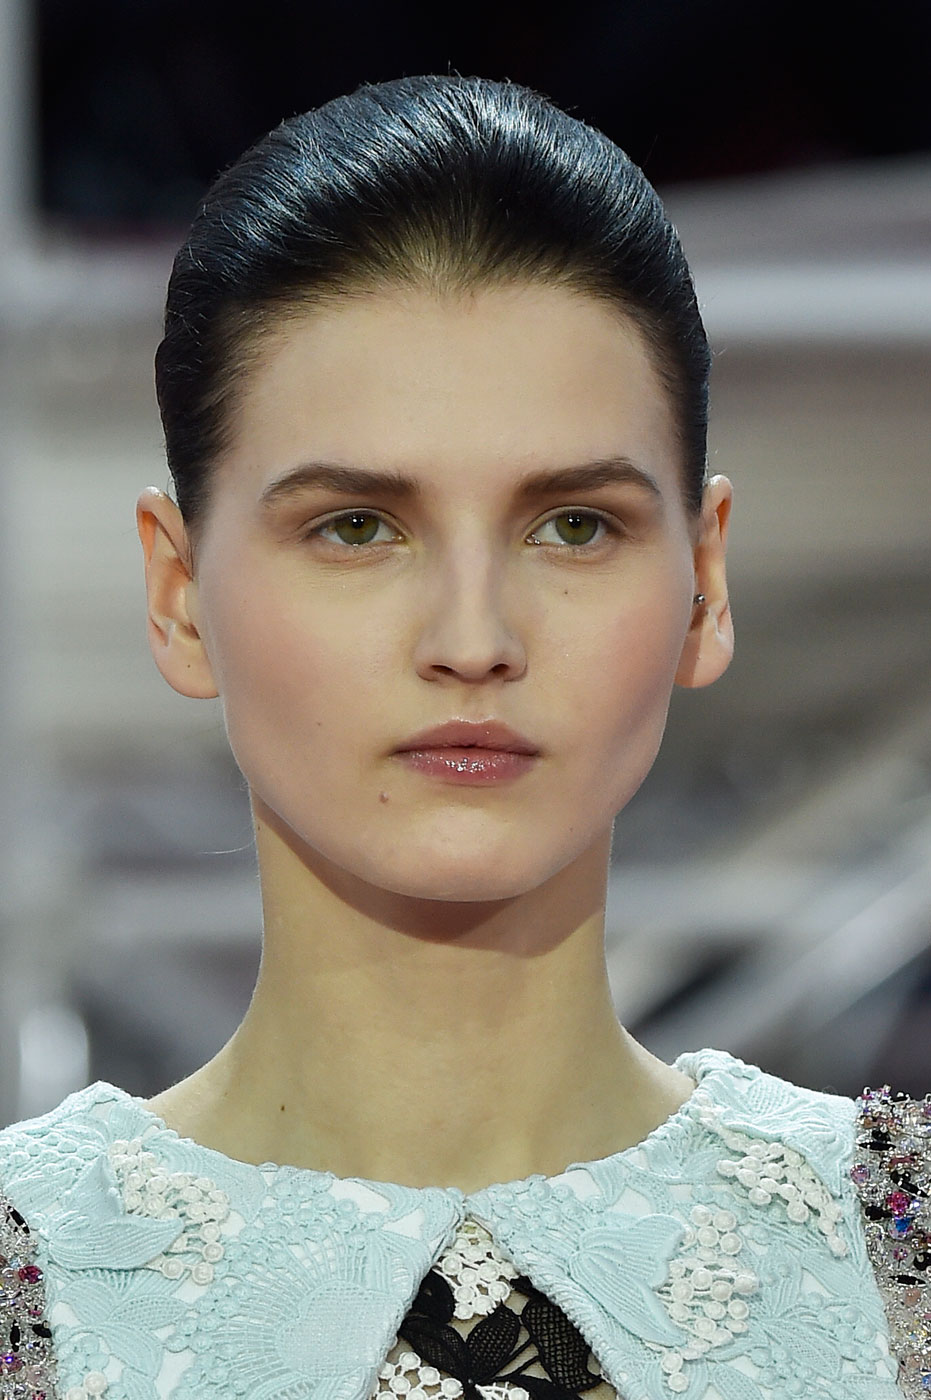 Christian-Dior-fashion-runway-show-close-ups-haute-couture-paris-spring-summer-2015-the-impression-042